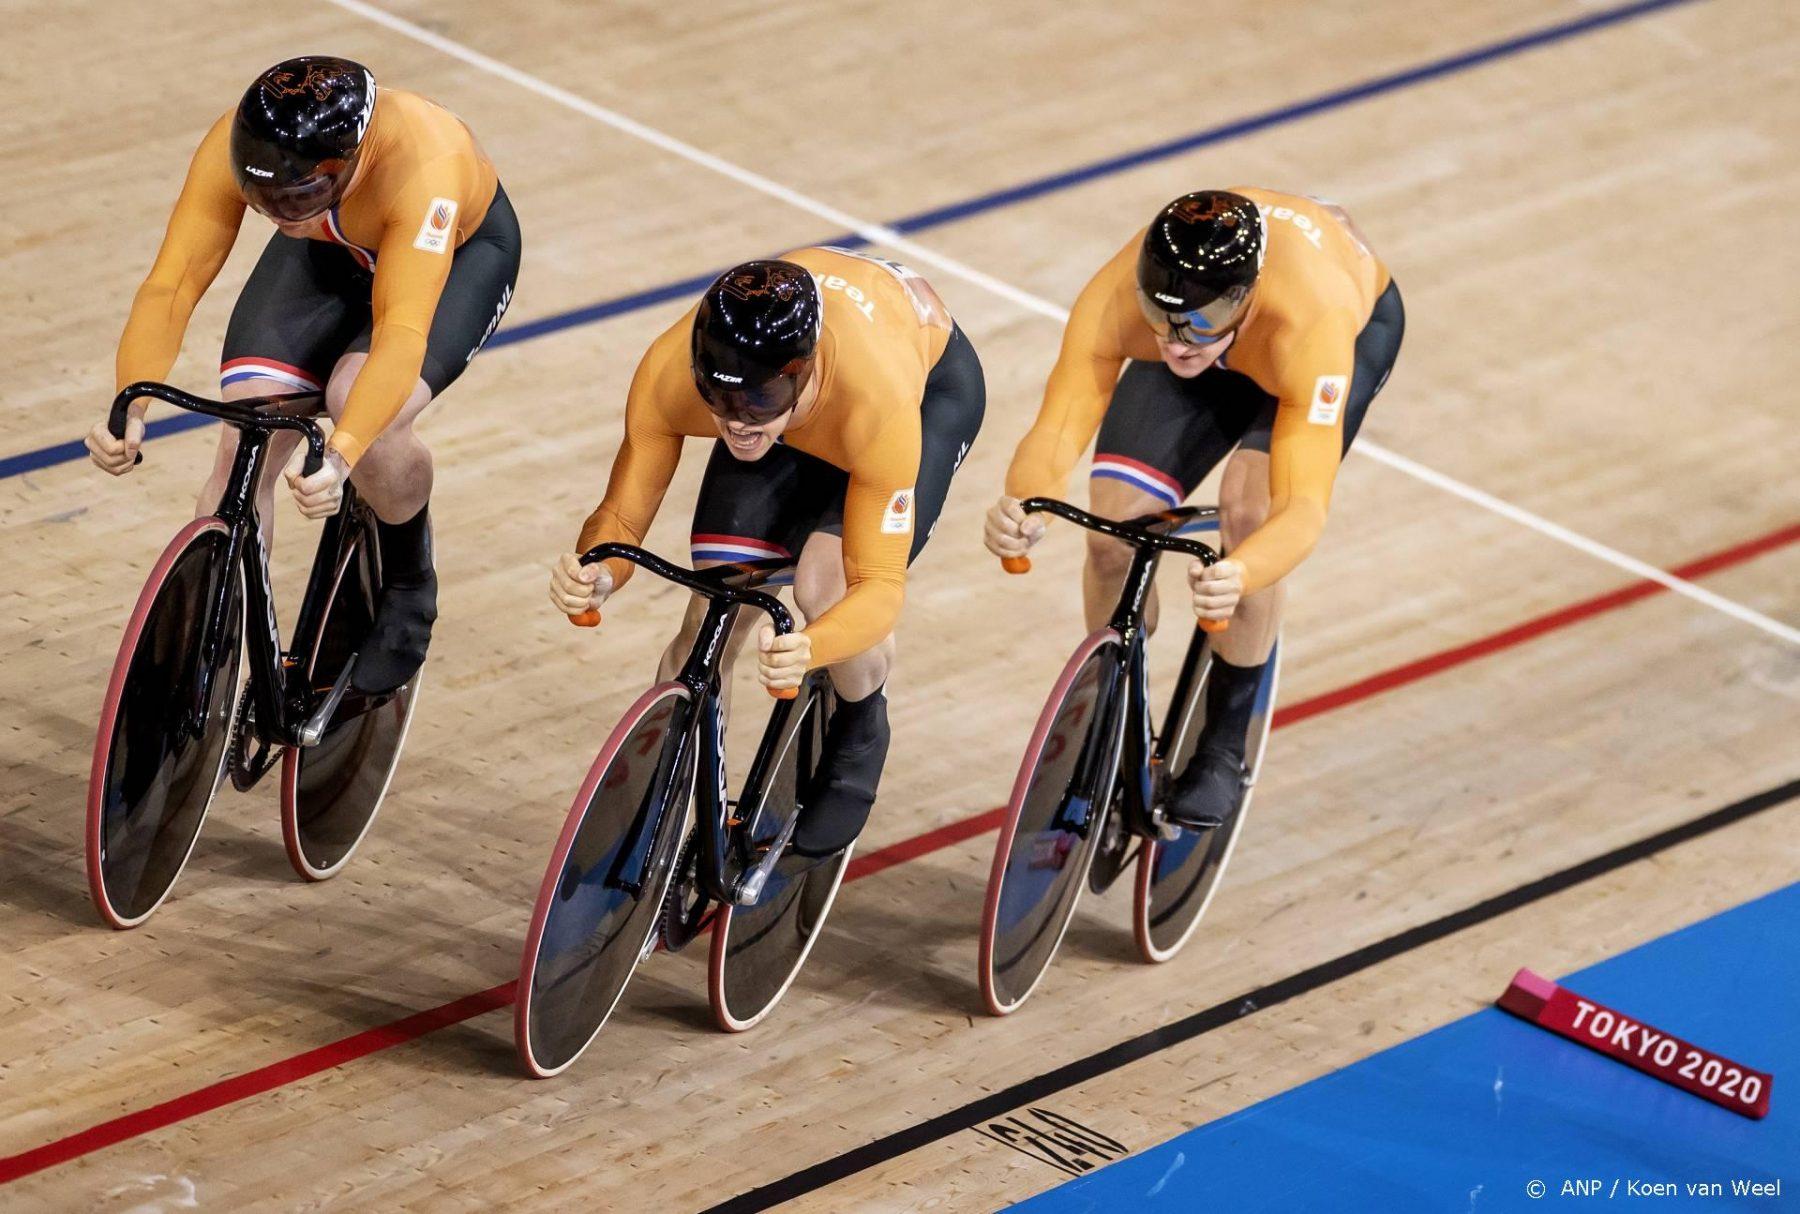 Teamsprinters bezorgen Nederland twintigste - en zesde gouden - plak